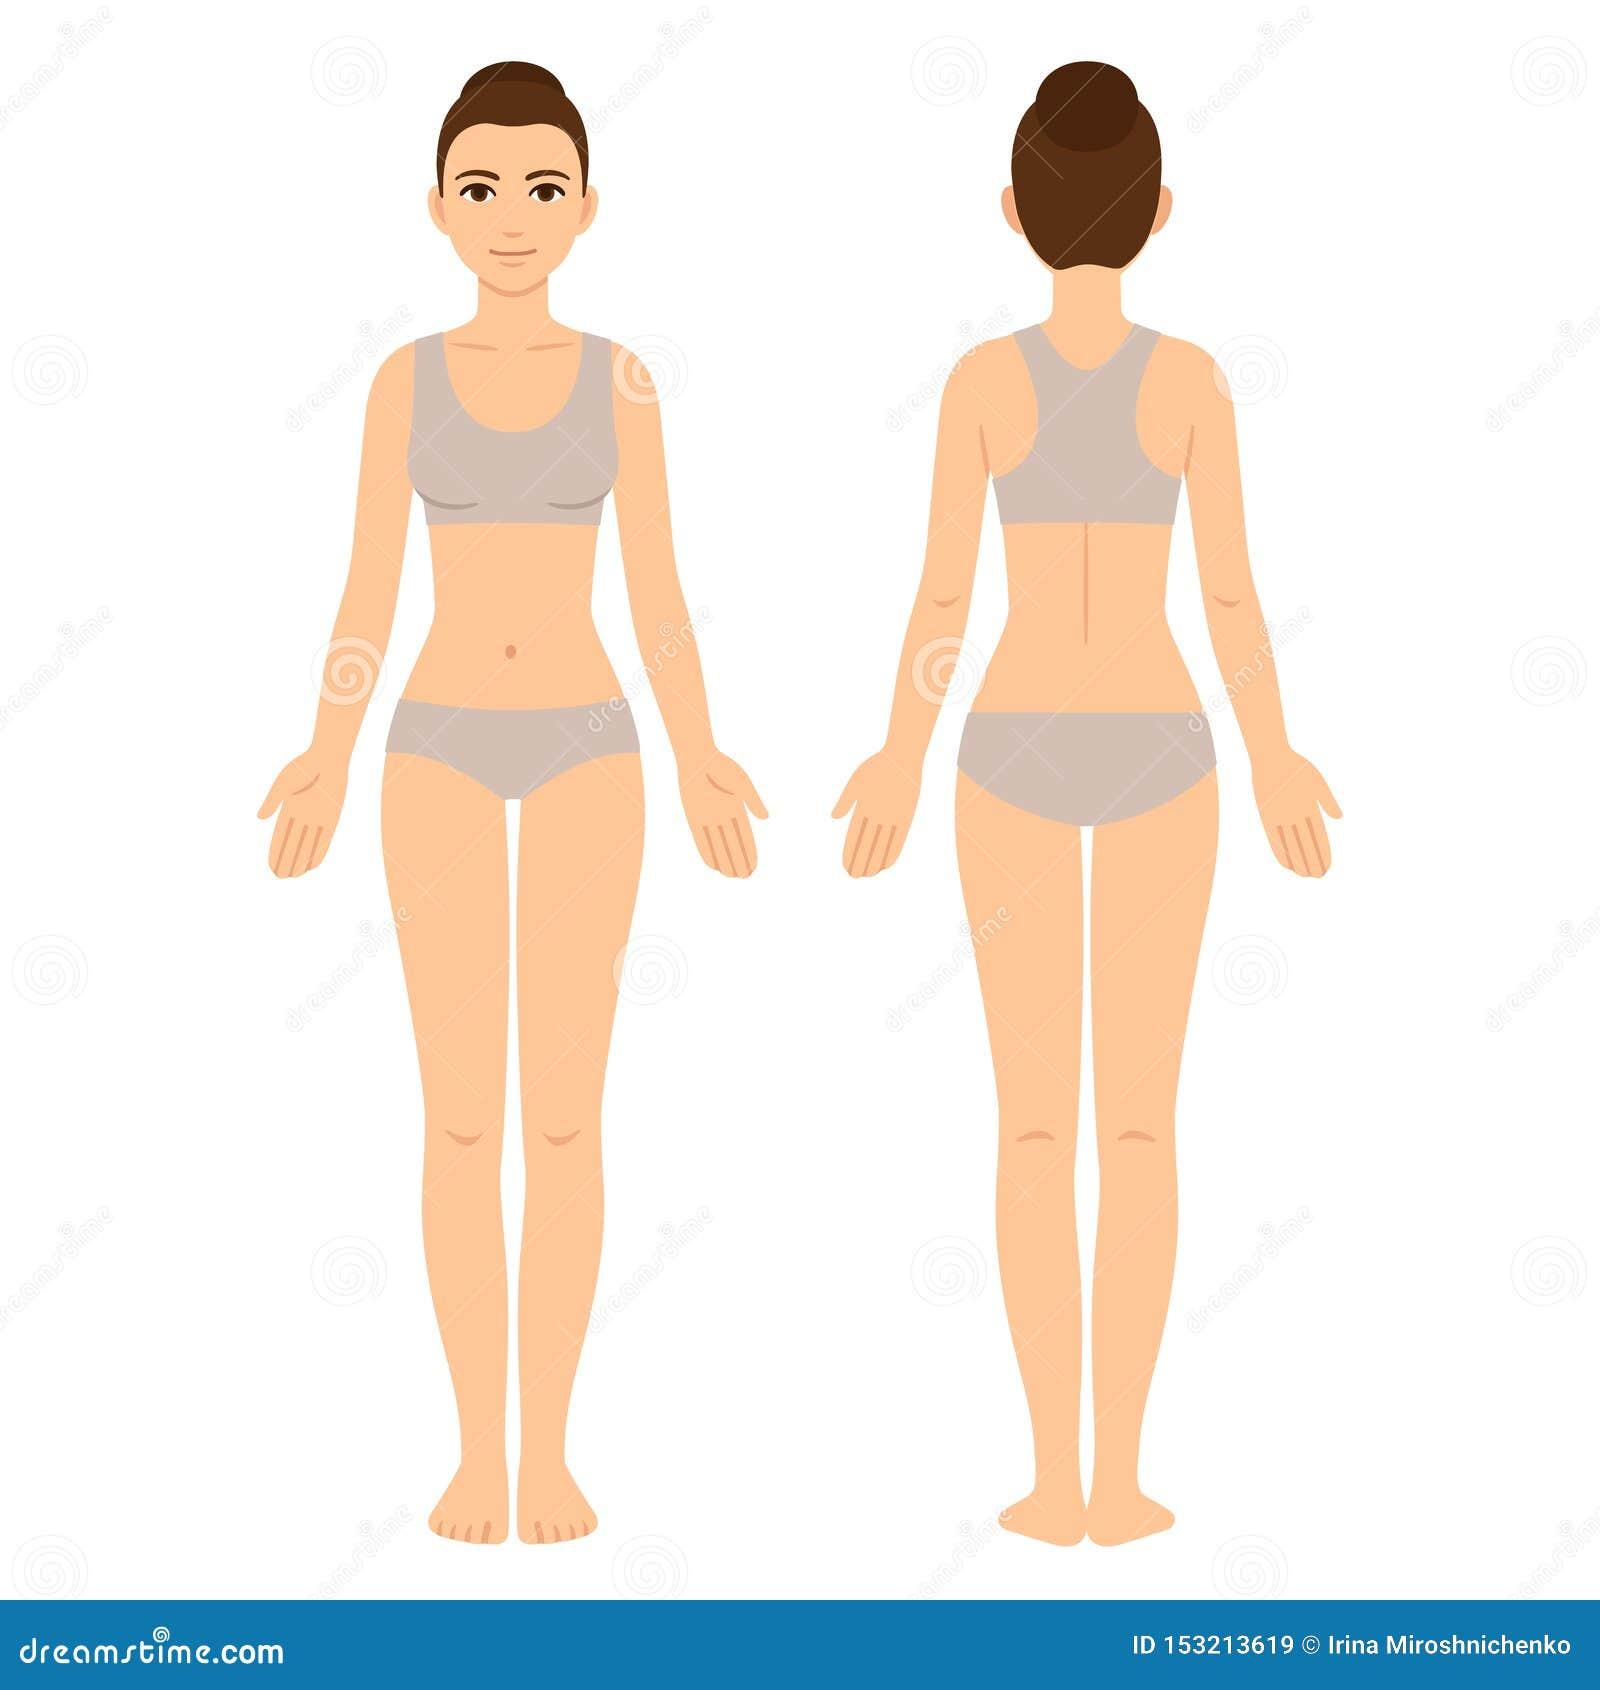 Art Photos Of Female Body